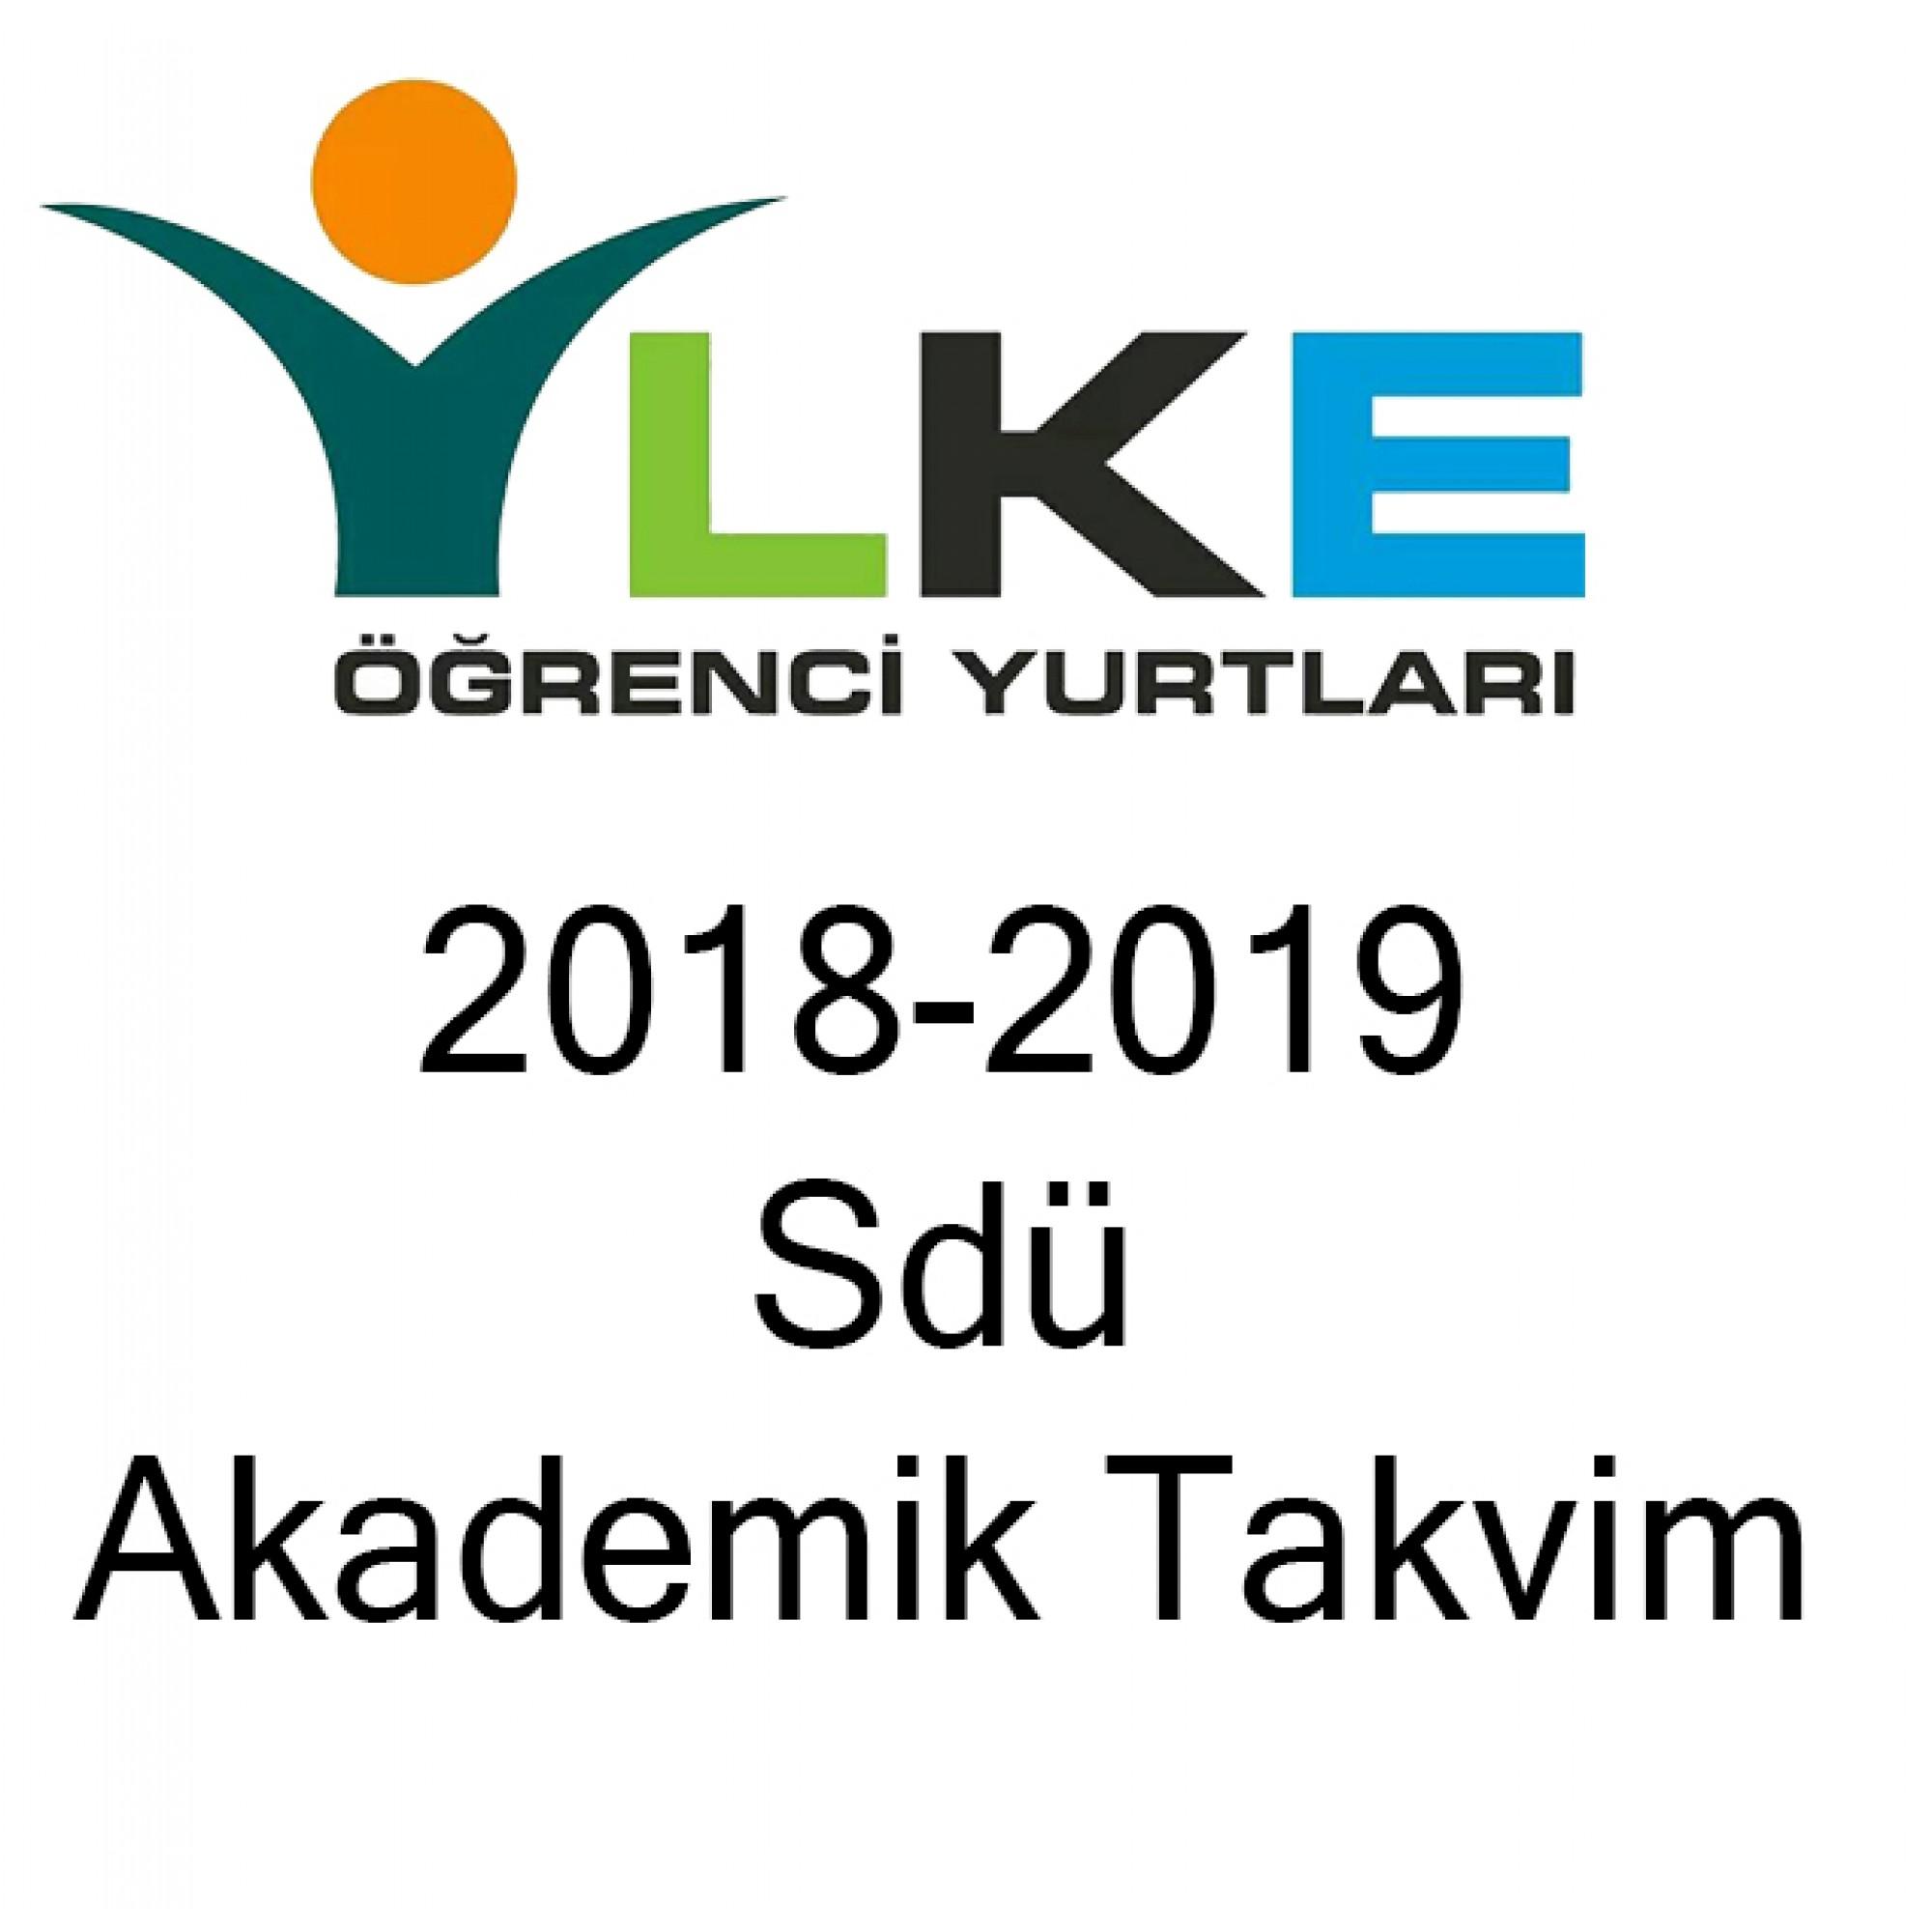 2018-2019 Sdü Akademik Takvim